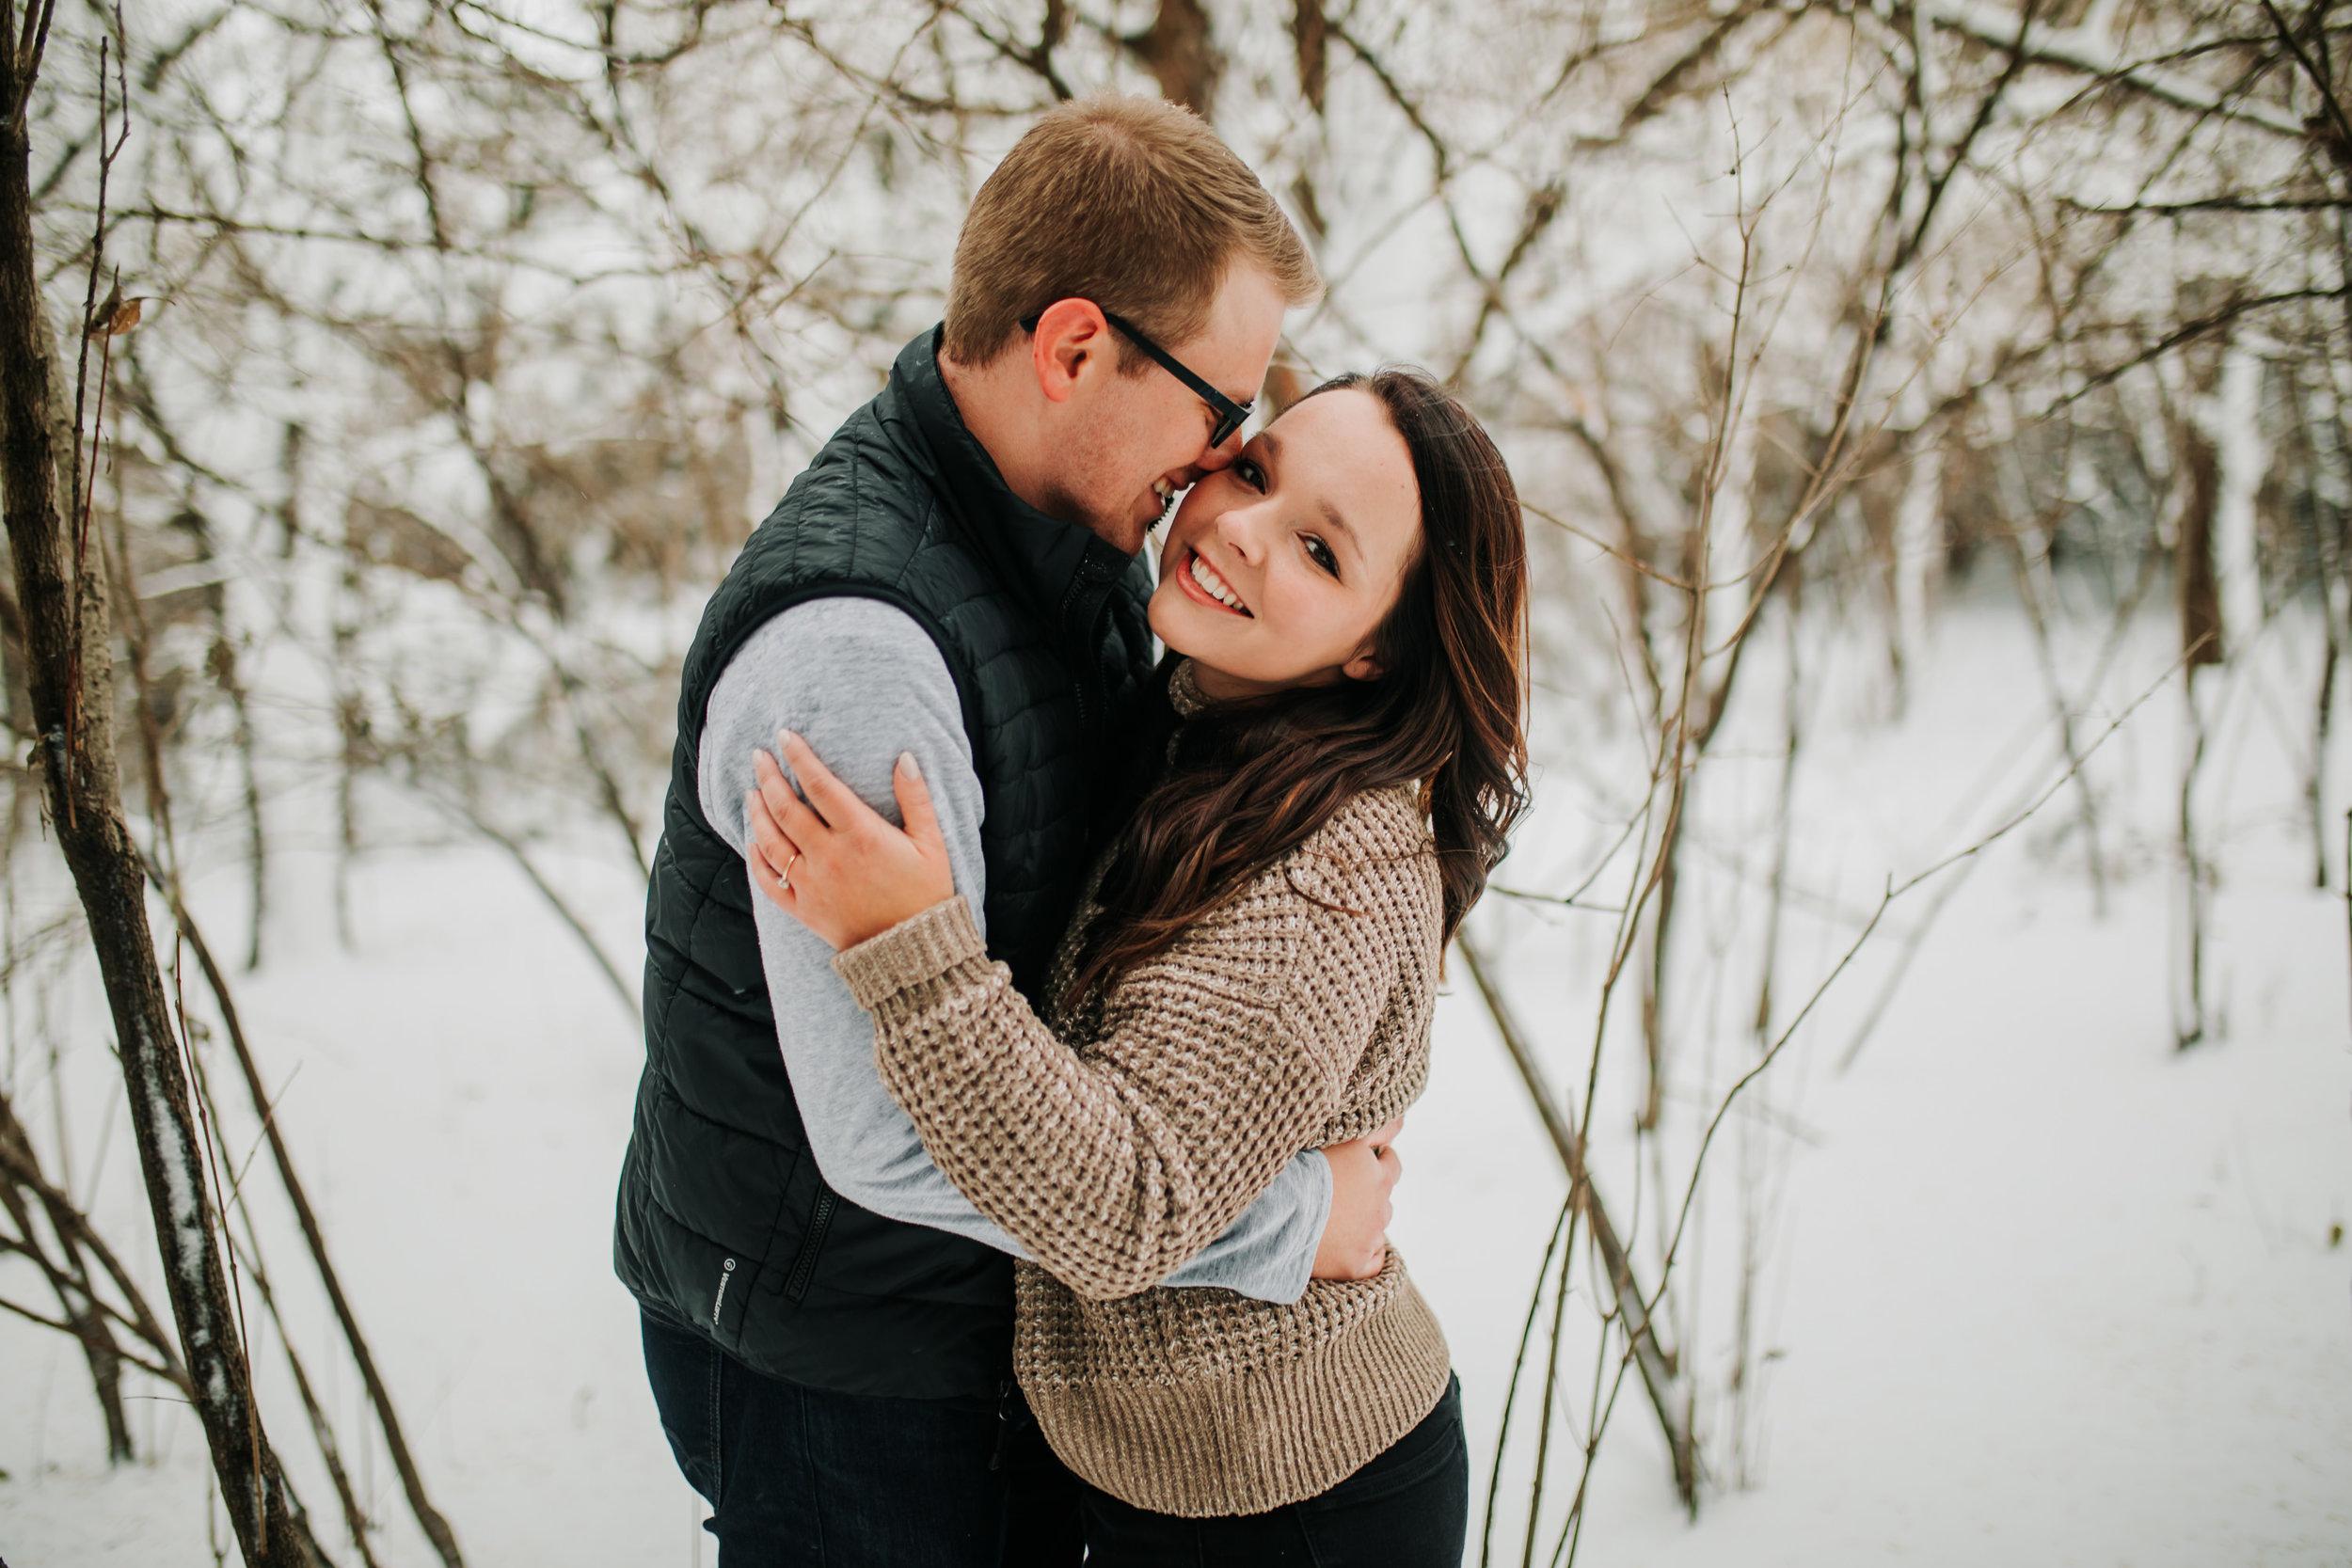 Vanessa & Dan - Engaged - Nathaniel Jensen Photography - Omaha Nebraska Wedding Photographer - Standing Bear Lake - Snowy Engagement Session-47.jpg